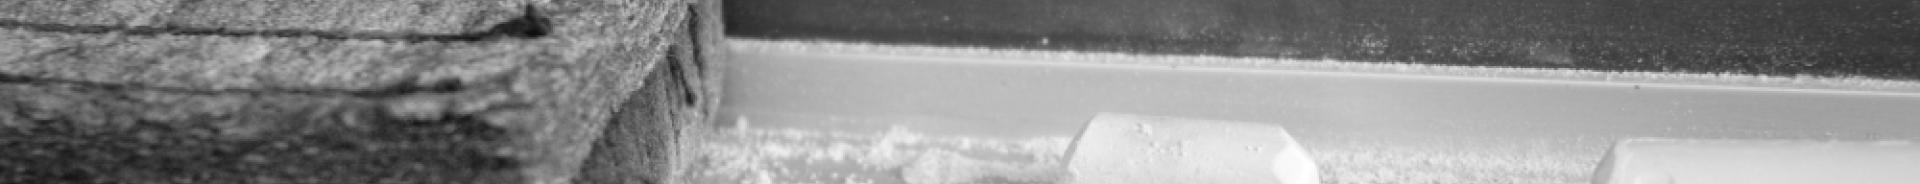 Immagine di una lavagna